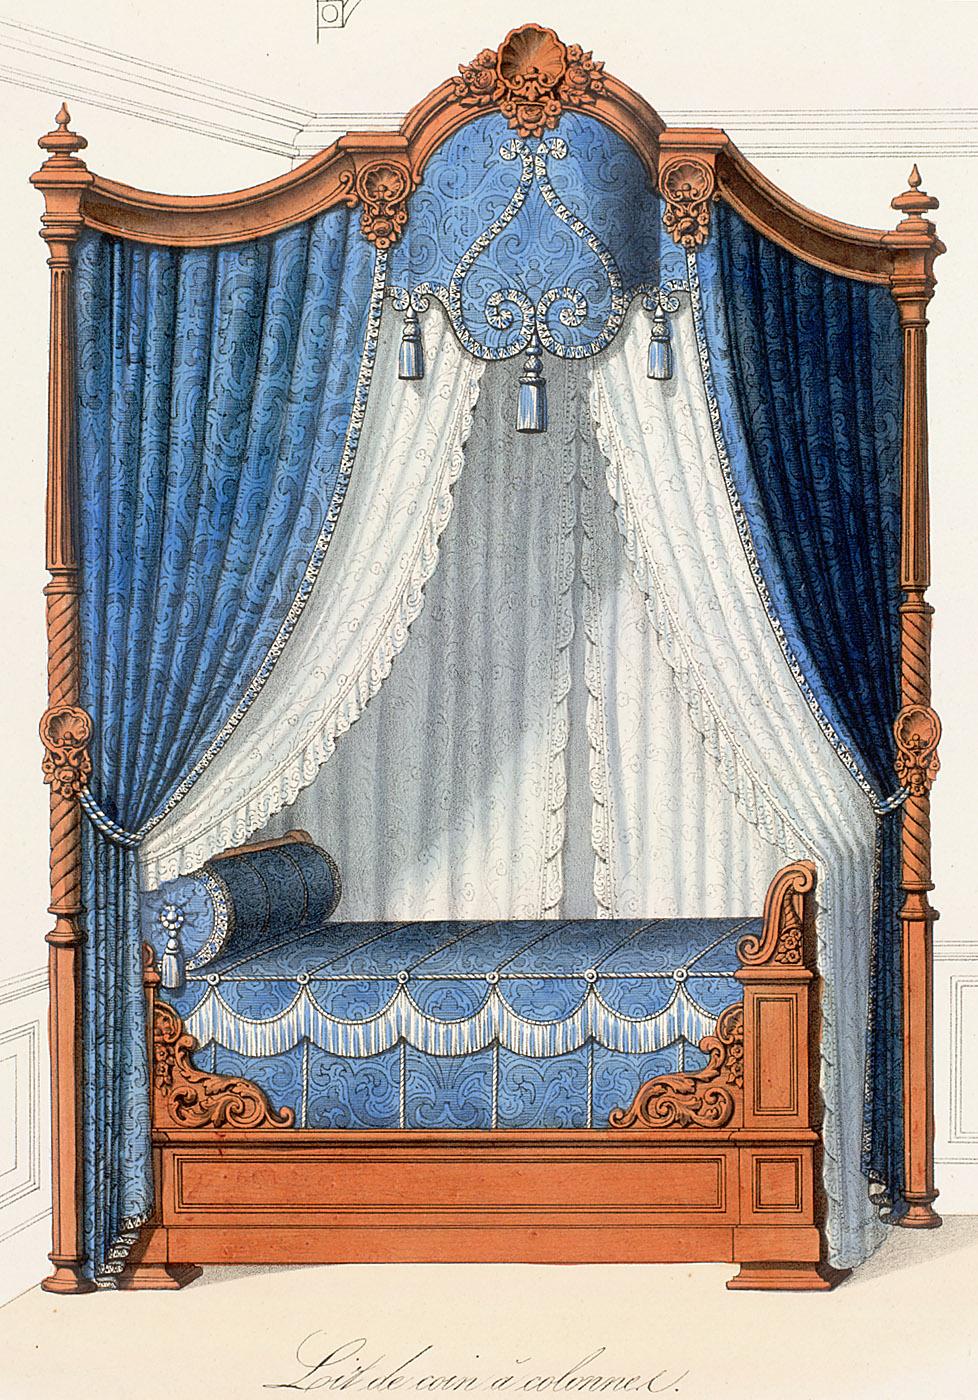 Beds (furniture),  Image number:SIL12-2-355b